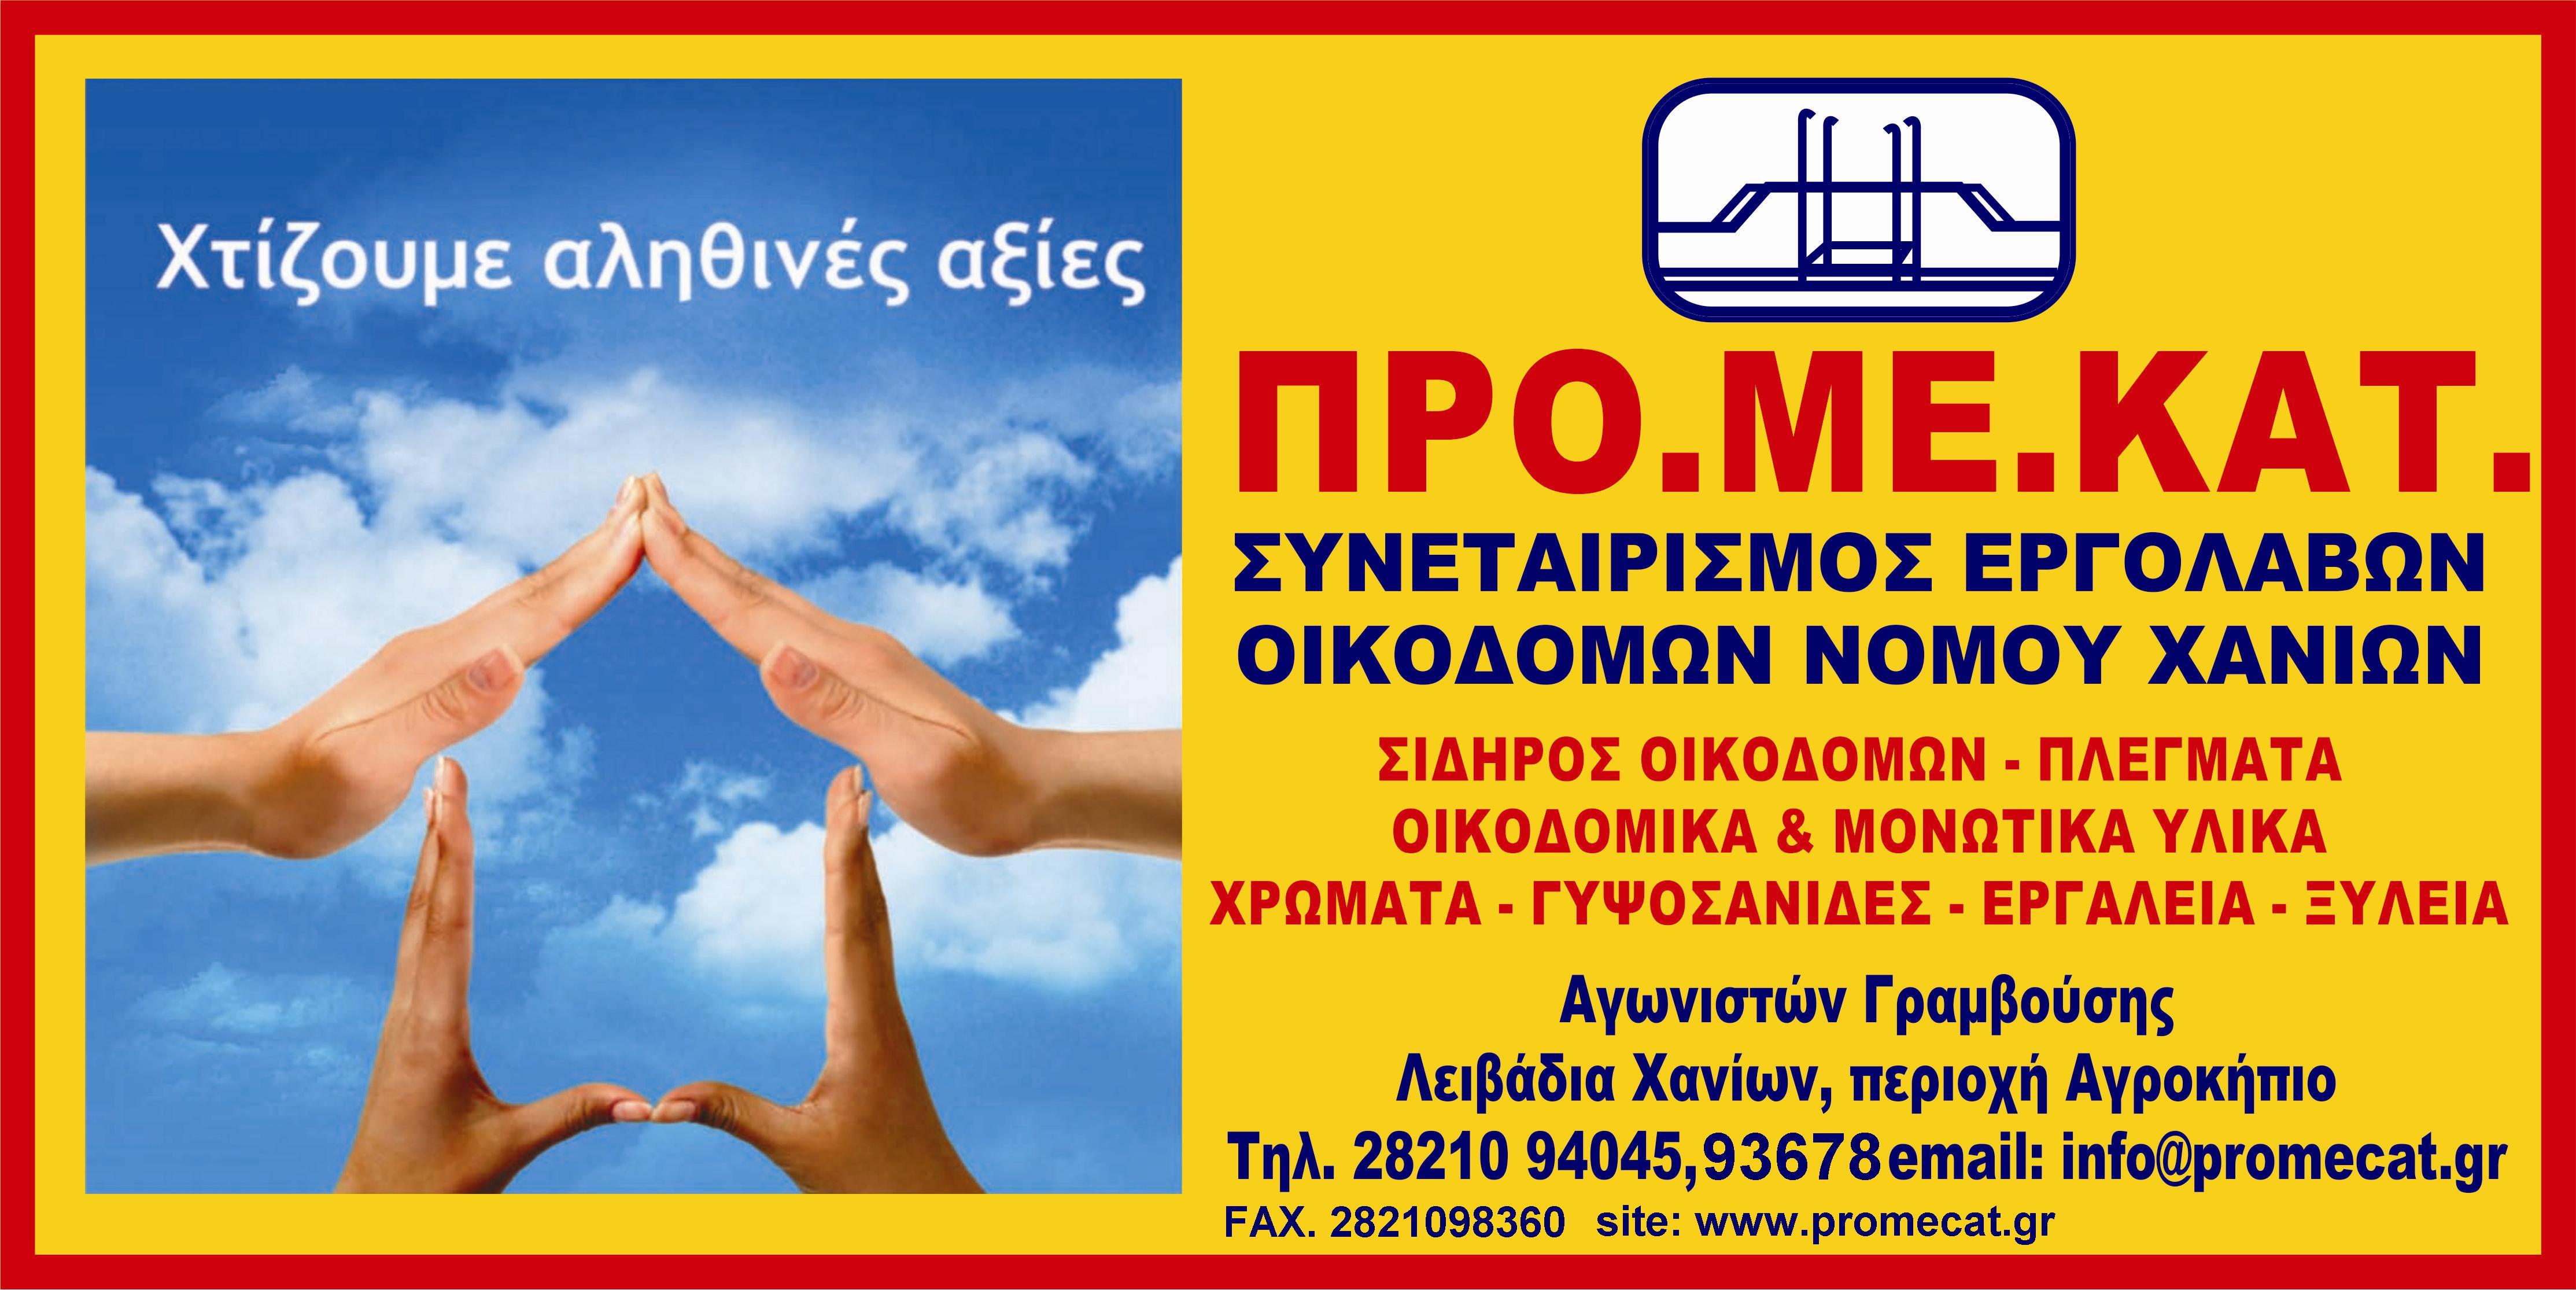 NEW_ΠΡΟΜΕΚΑΤ